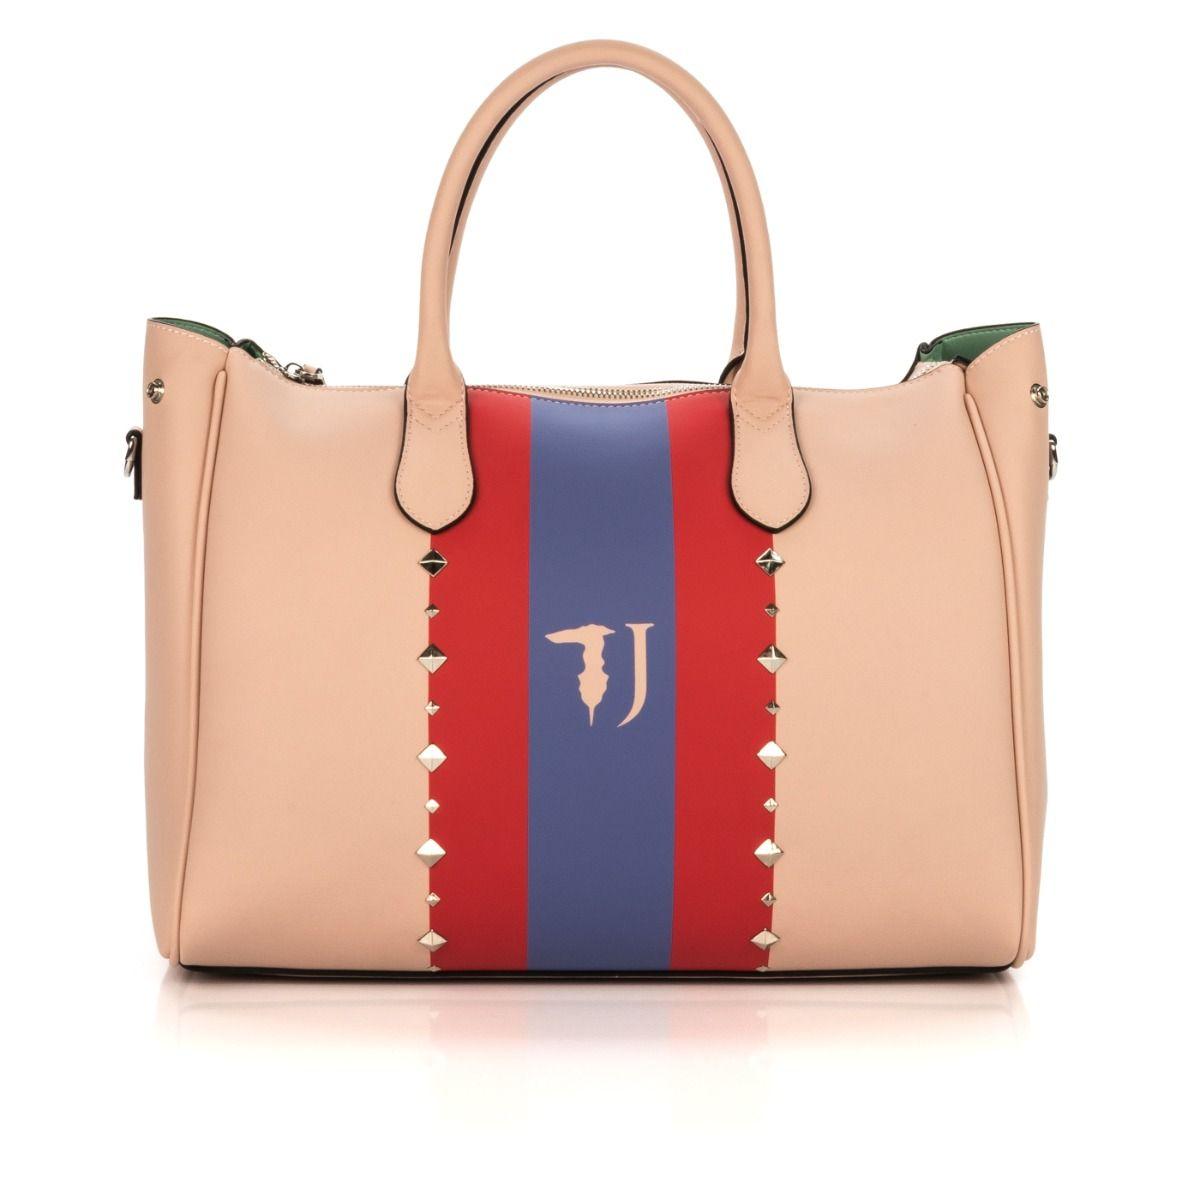 0a7b16e678 Borsa a mano donna TRUSSARDI JEANS 75B00173999-P010 similpelle rosa borchie  |Spedizione gratuita|Shop online|Shoe Center